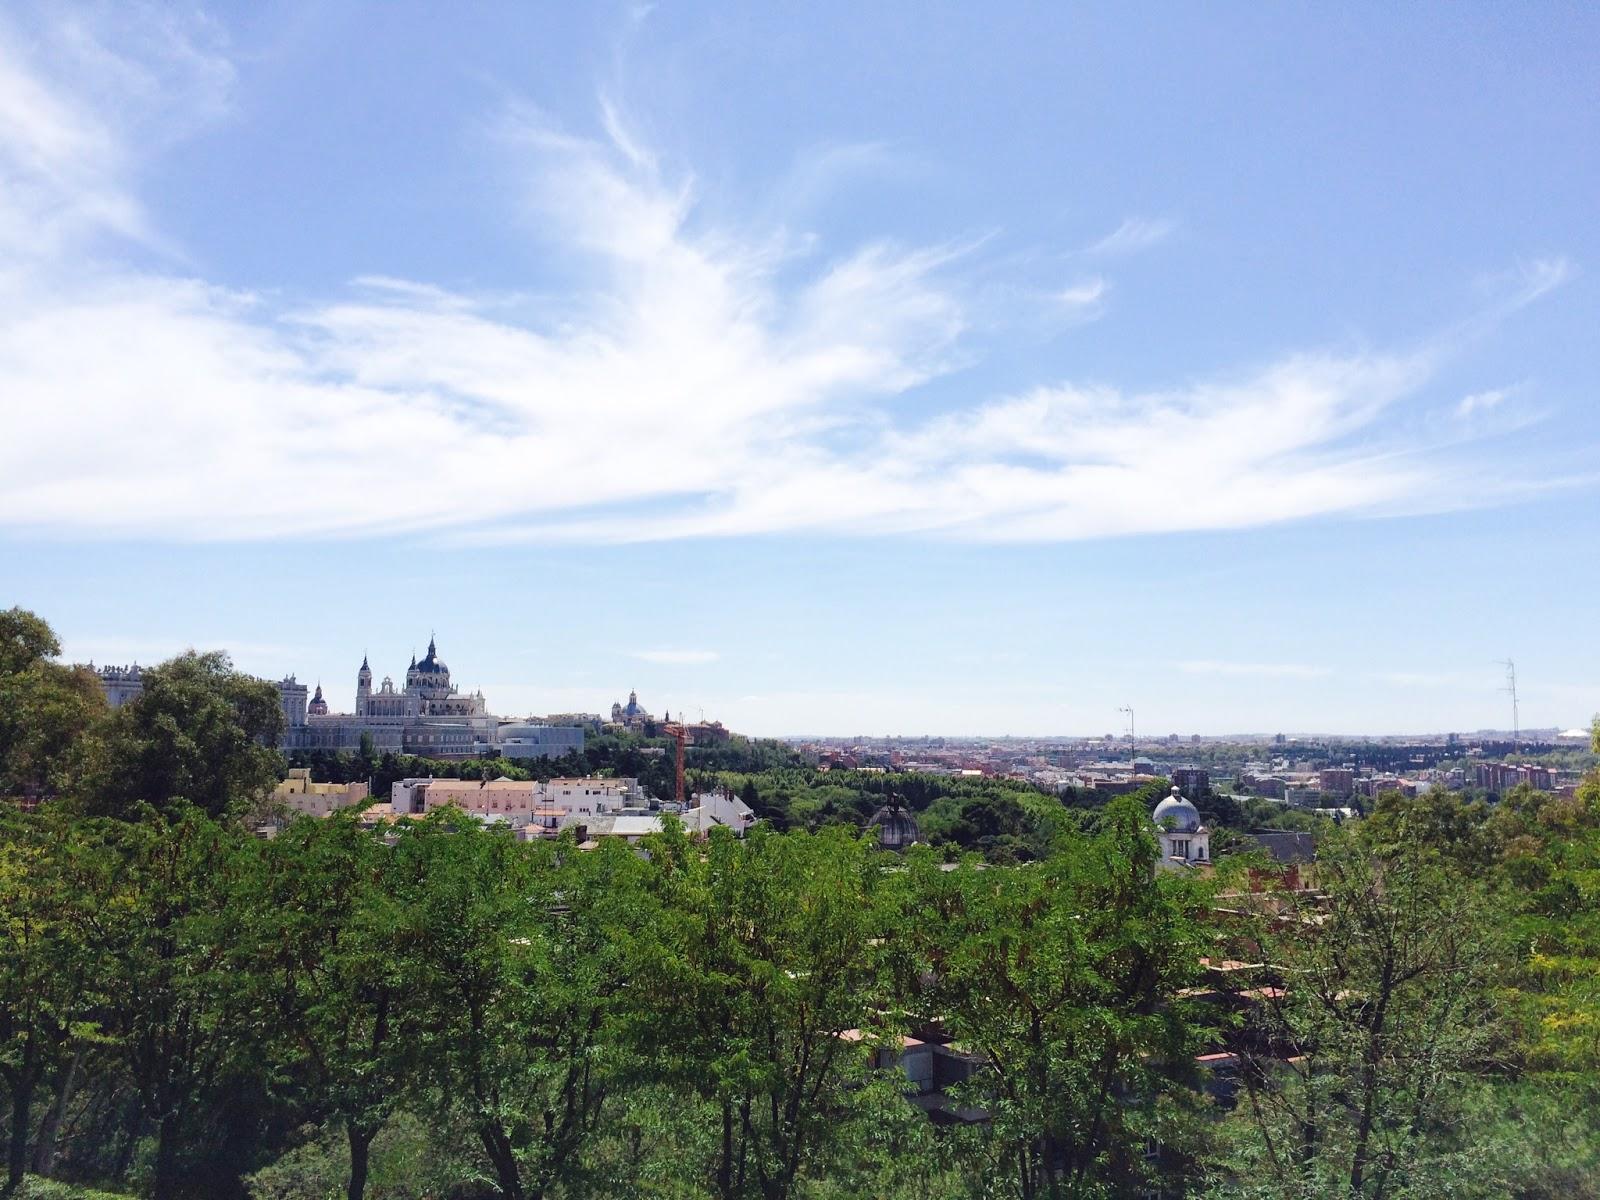 Templo de Debod Madrid - Hotspot